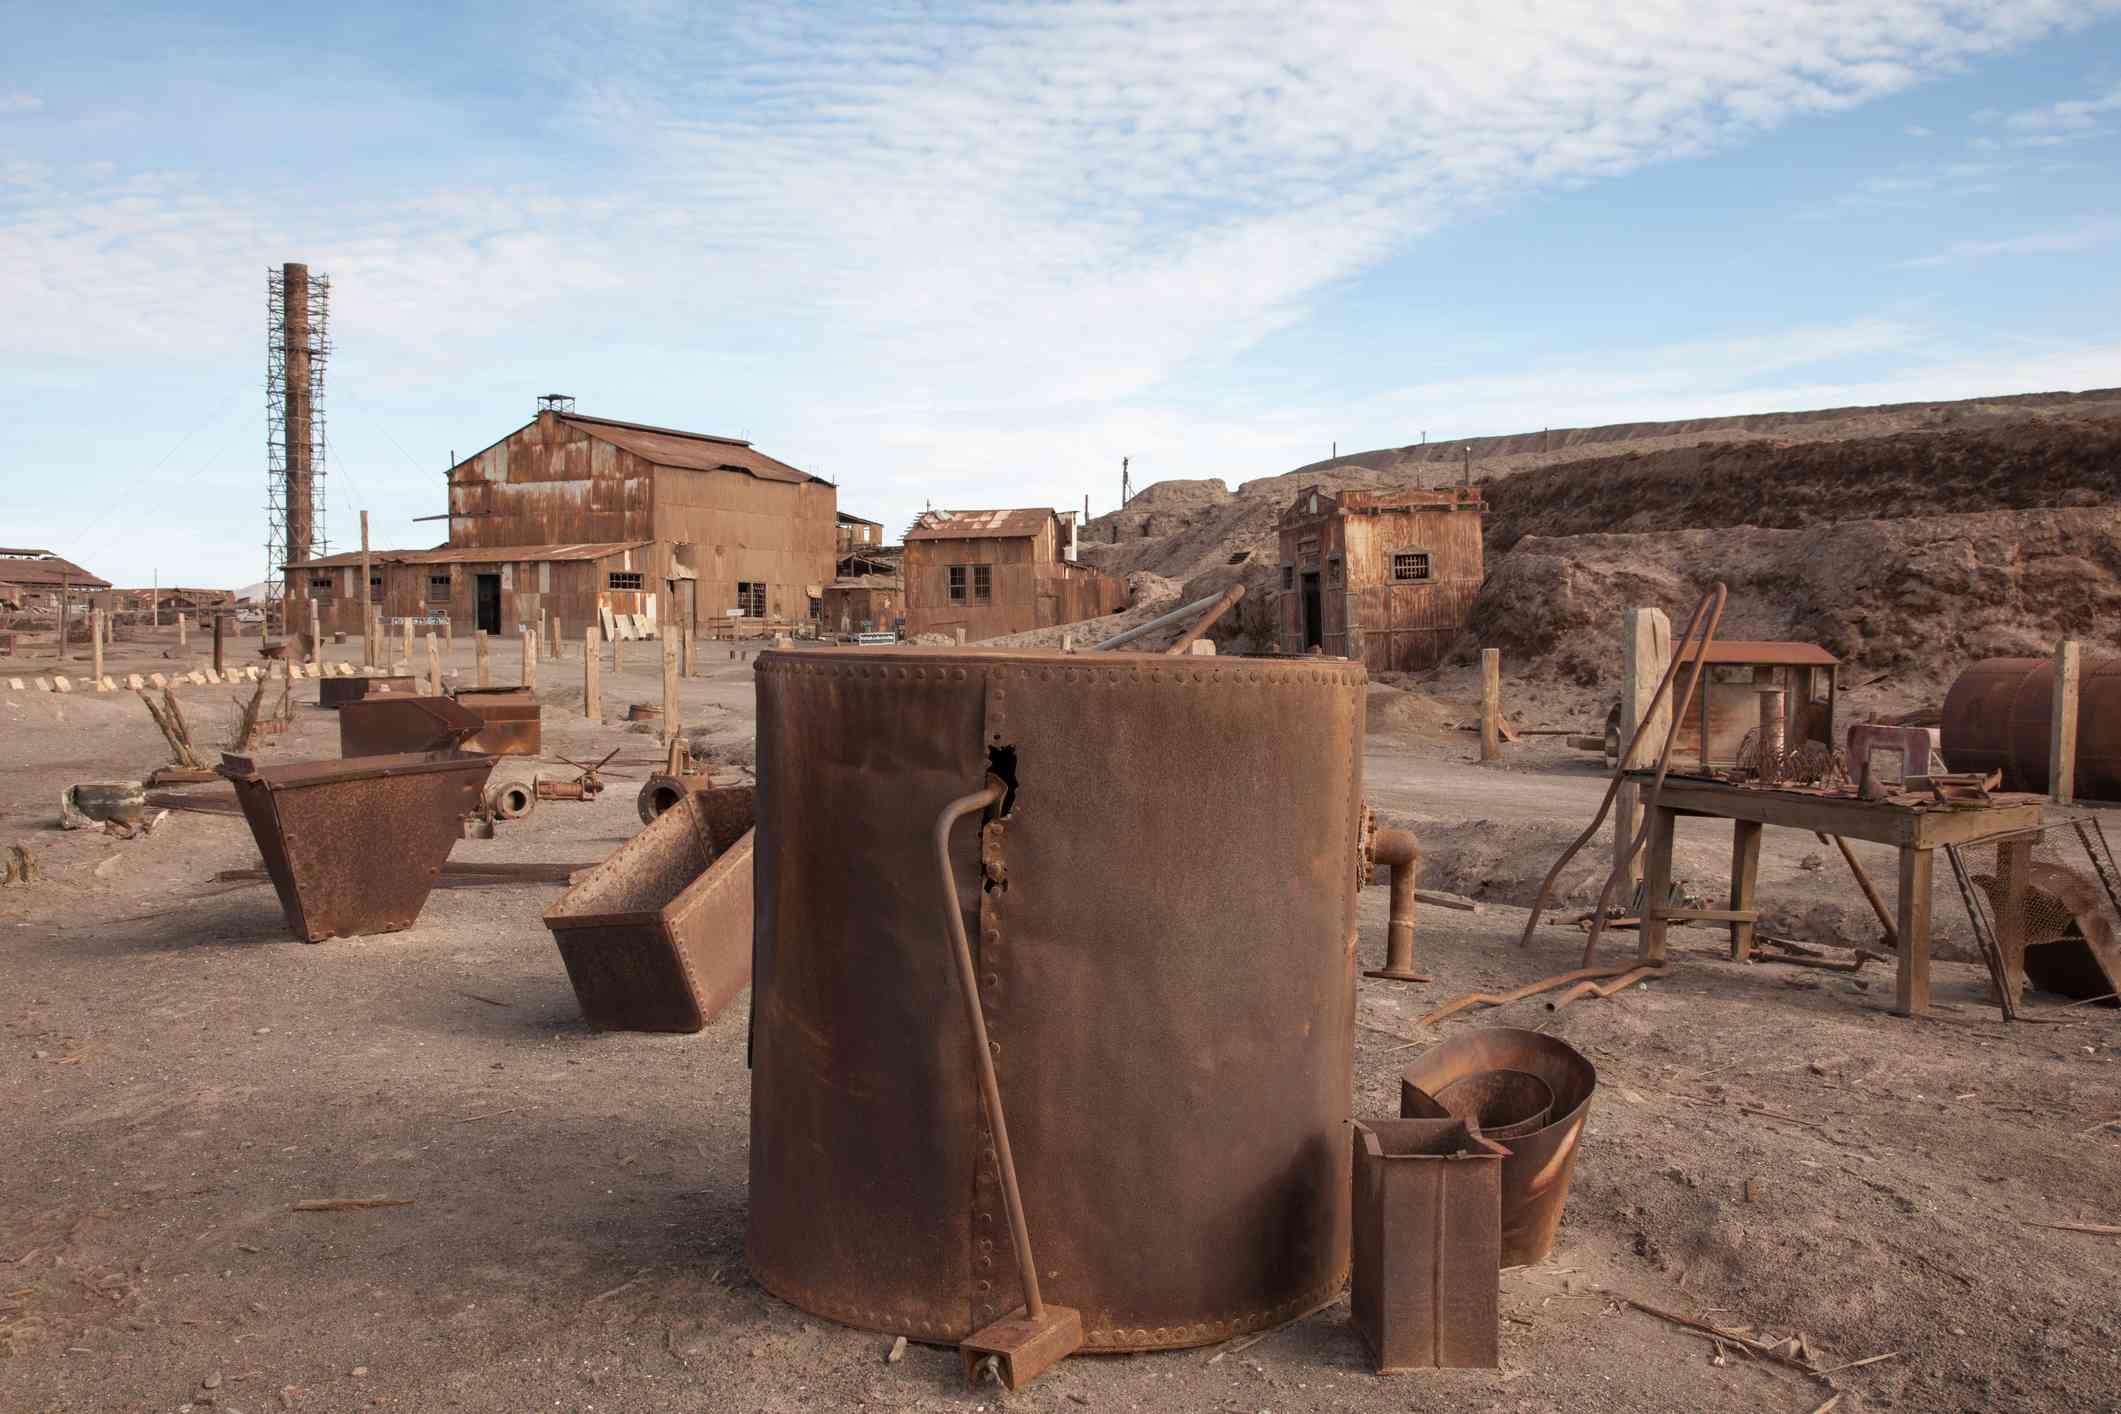 Humberstone ghost town, near Iquique, Tarapaca, Chile.